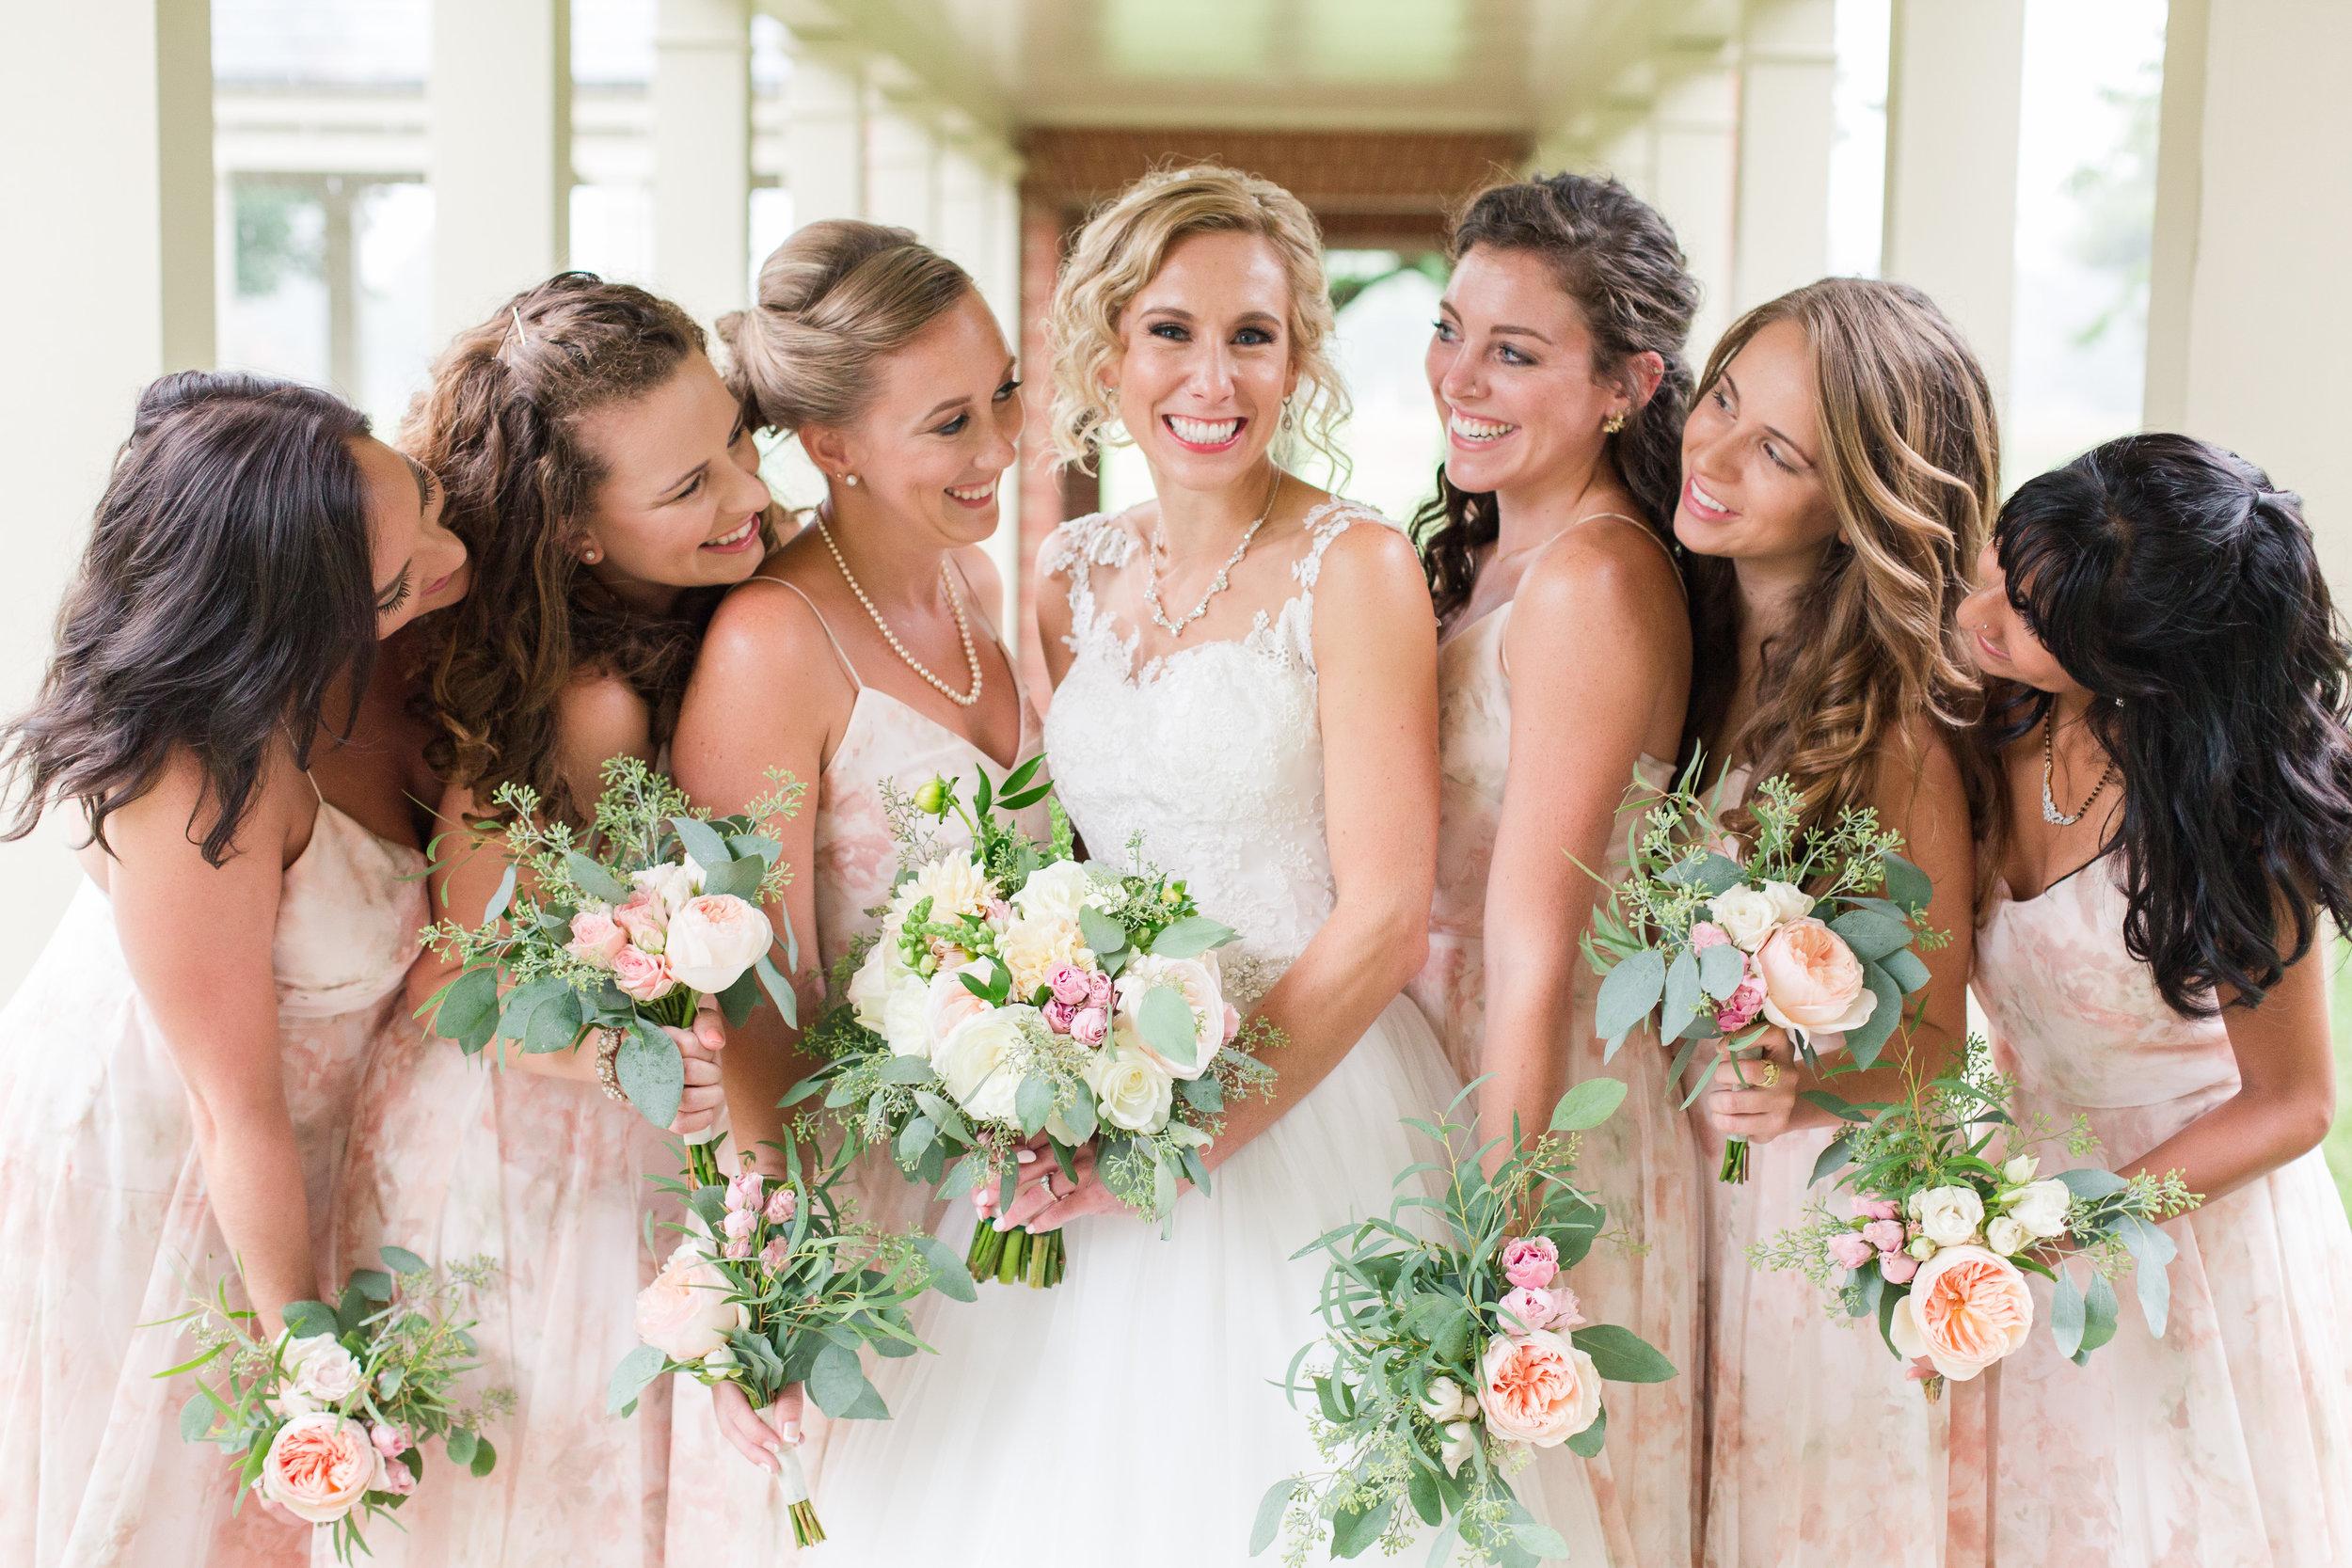 Michael Kara Wedding- Bridal Party Portraits-20.jpg